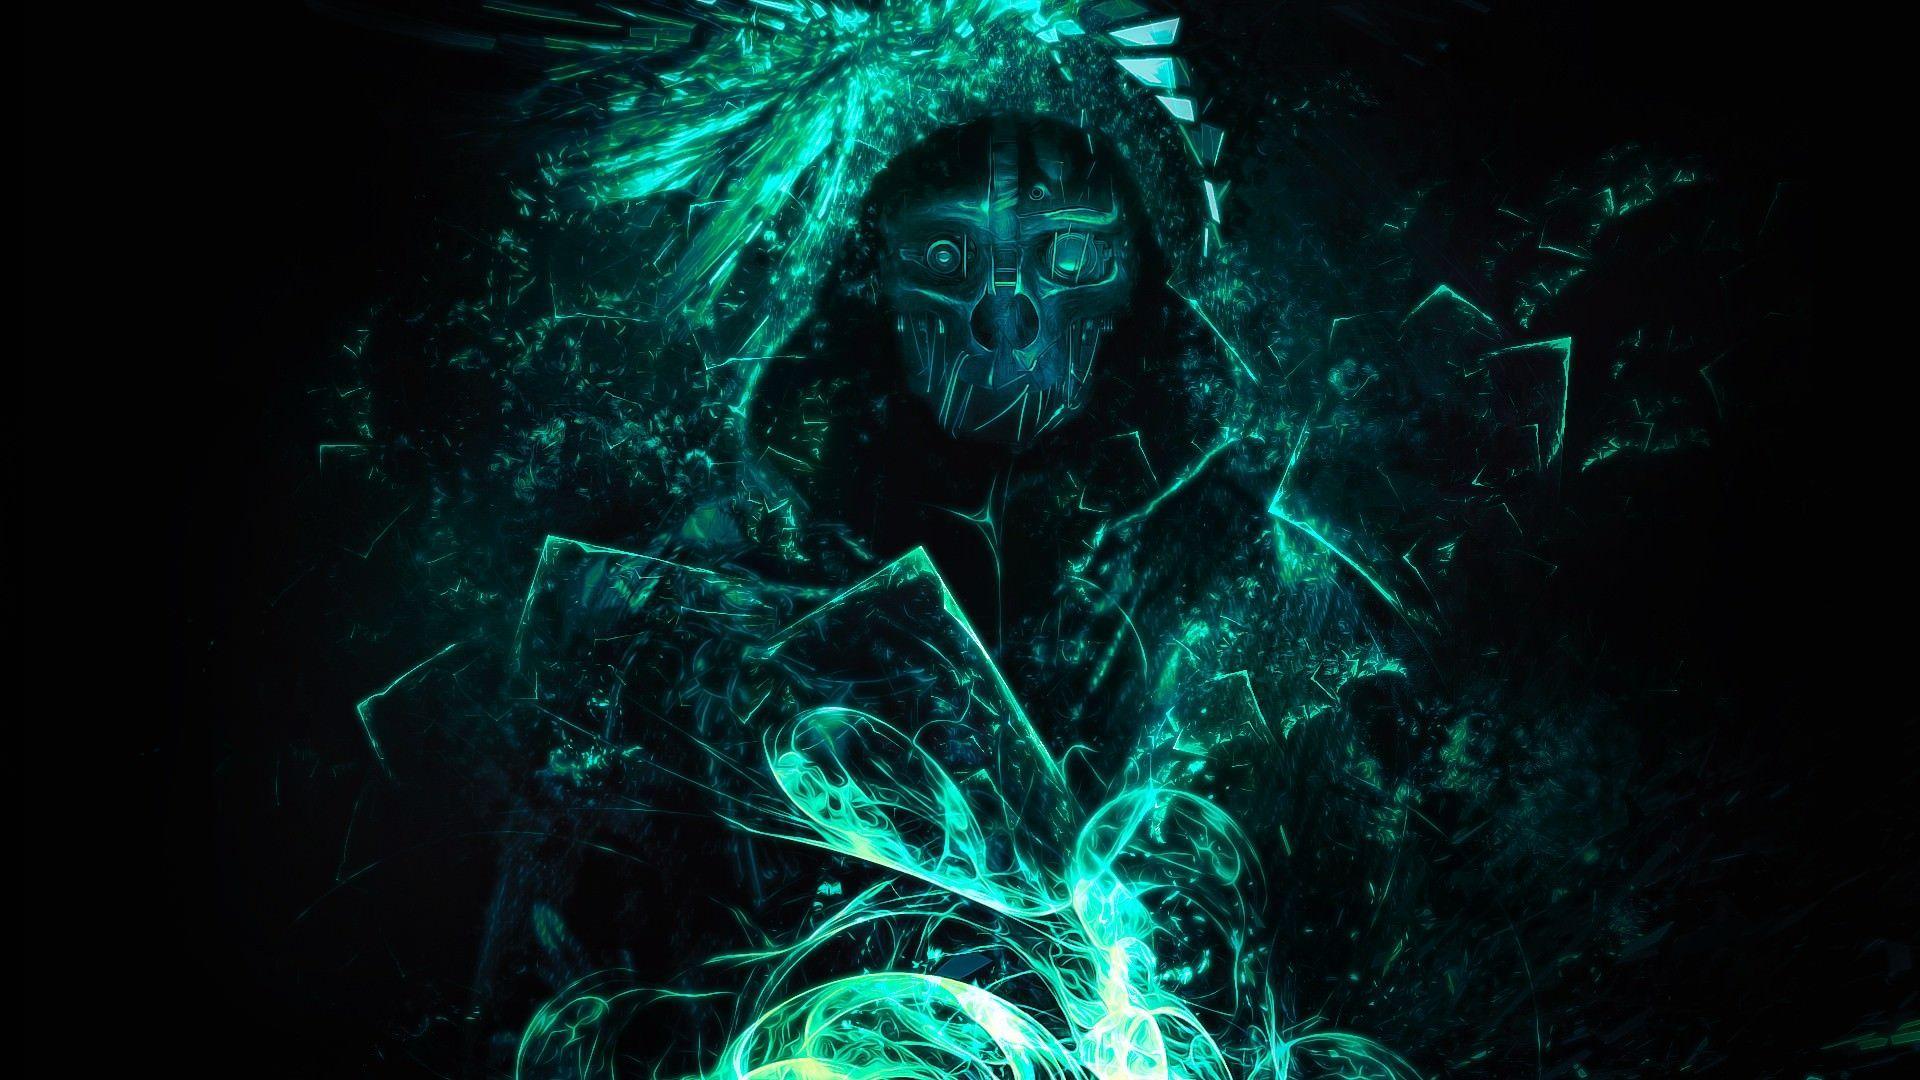 Green Gaming Wallpaper Hd